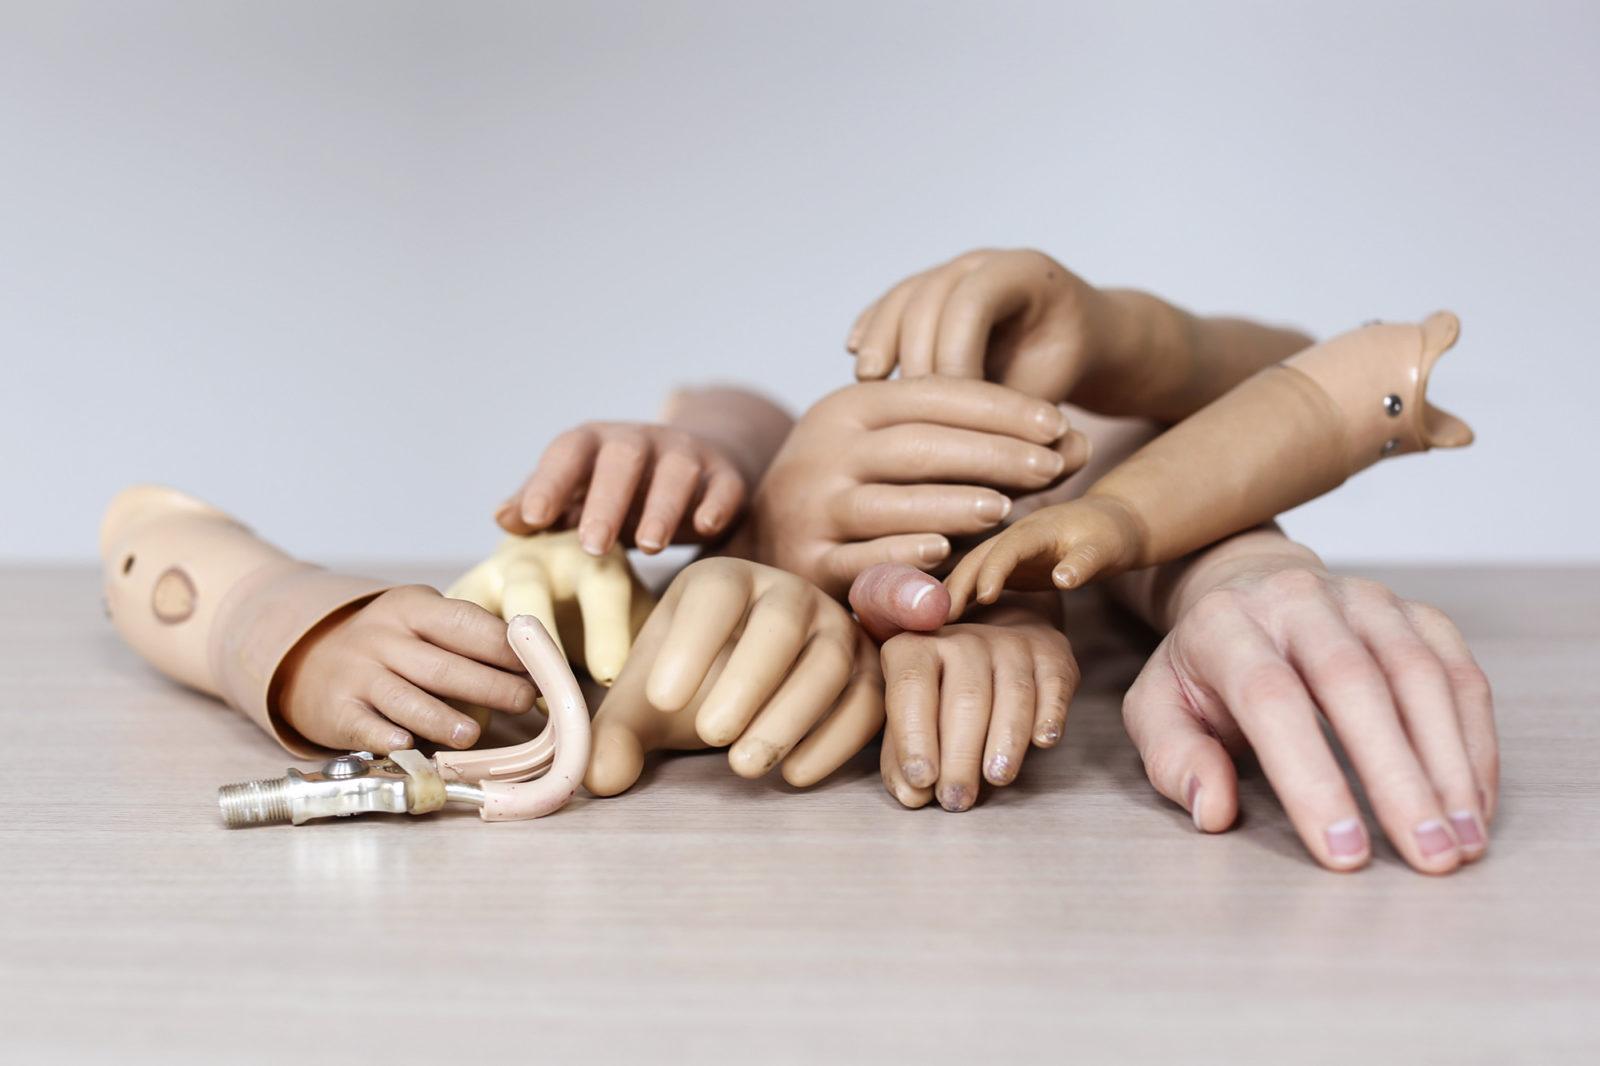 reportage protheses Hoopje handen – Sanne